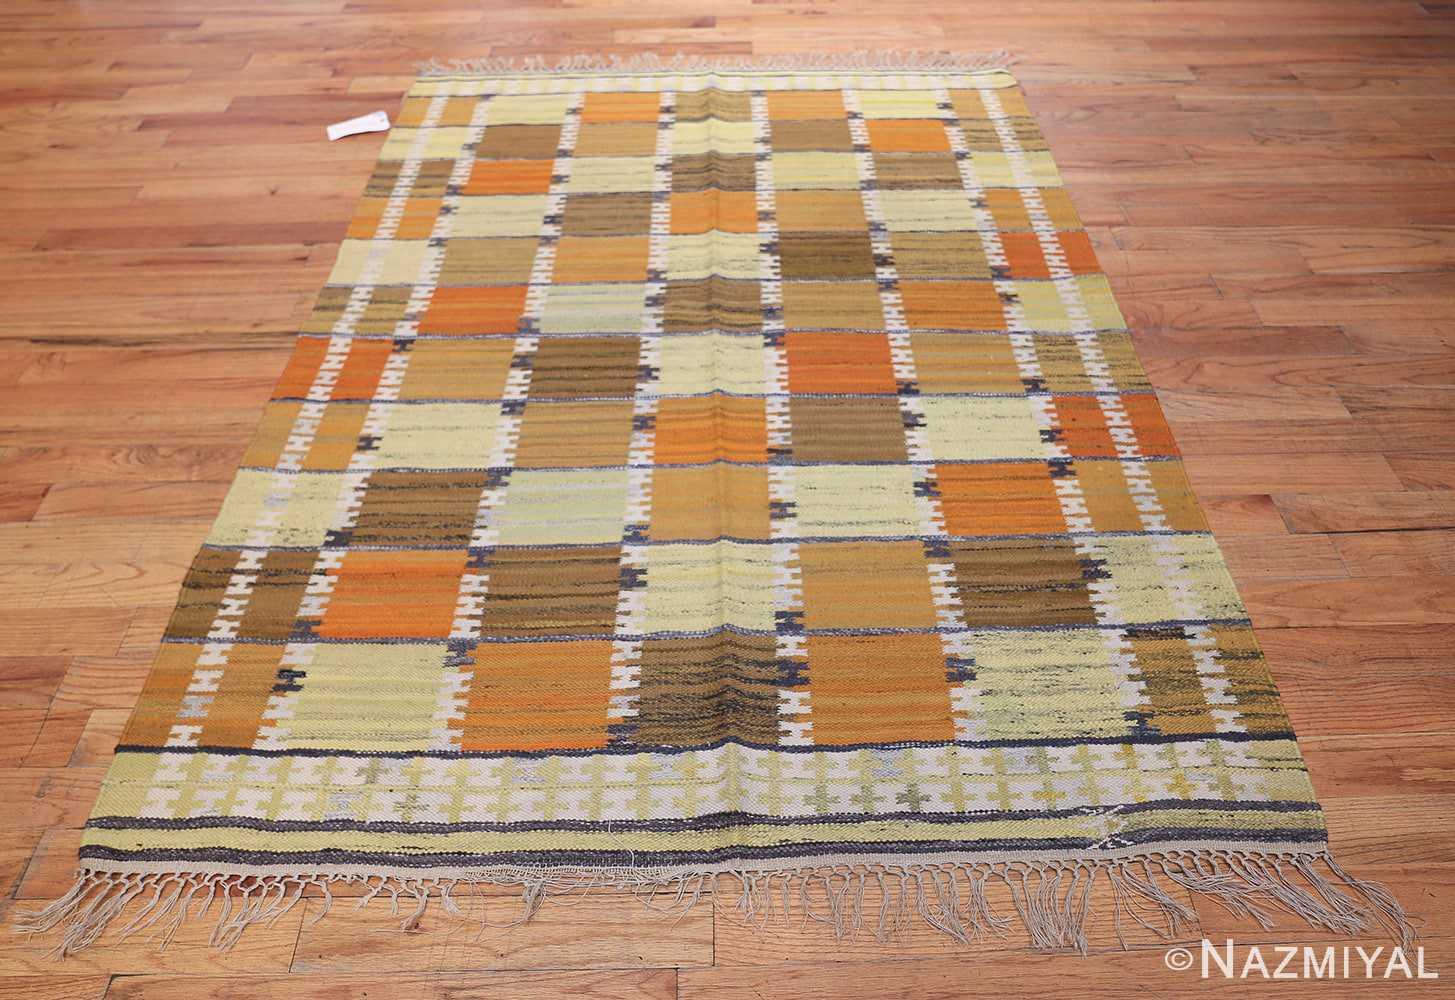 Vintage Scandinavian Rug by Wanda Krakow 46858 Whole Design Nazmiyal